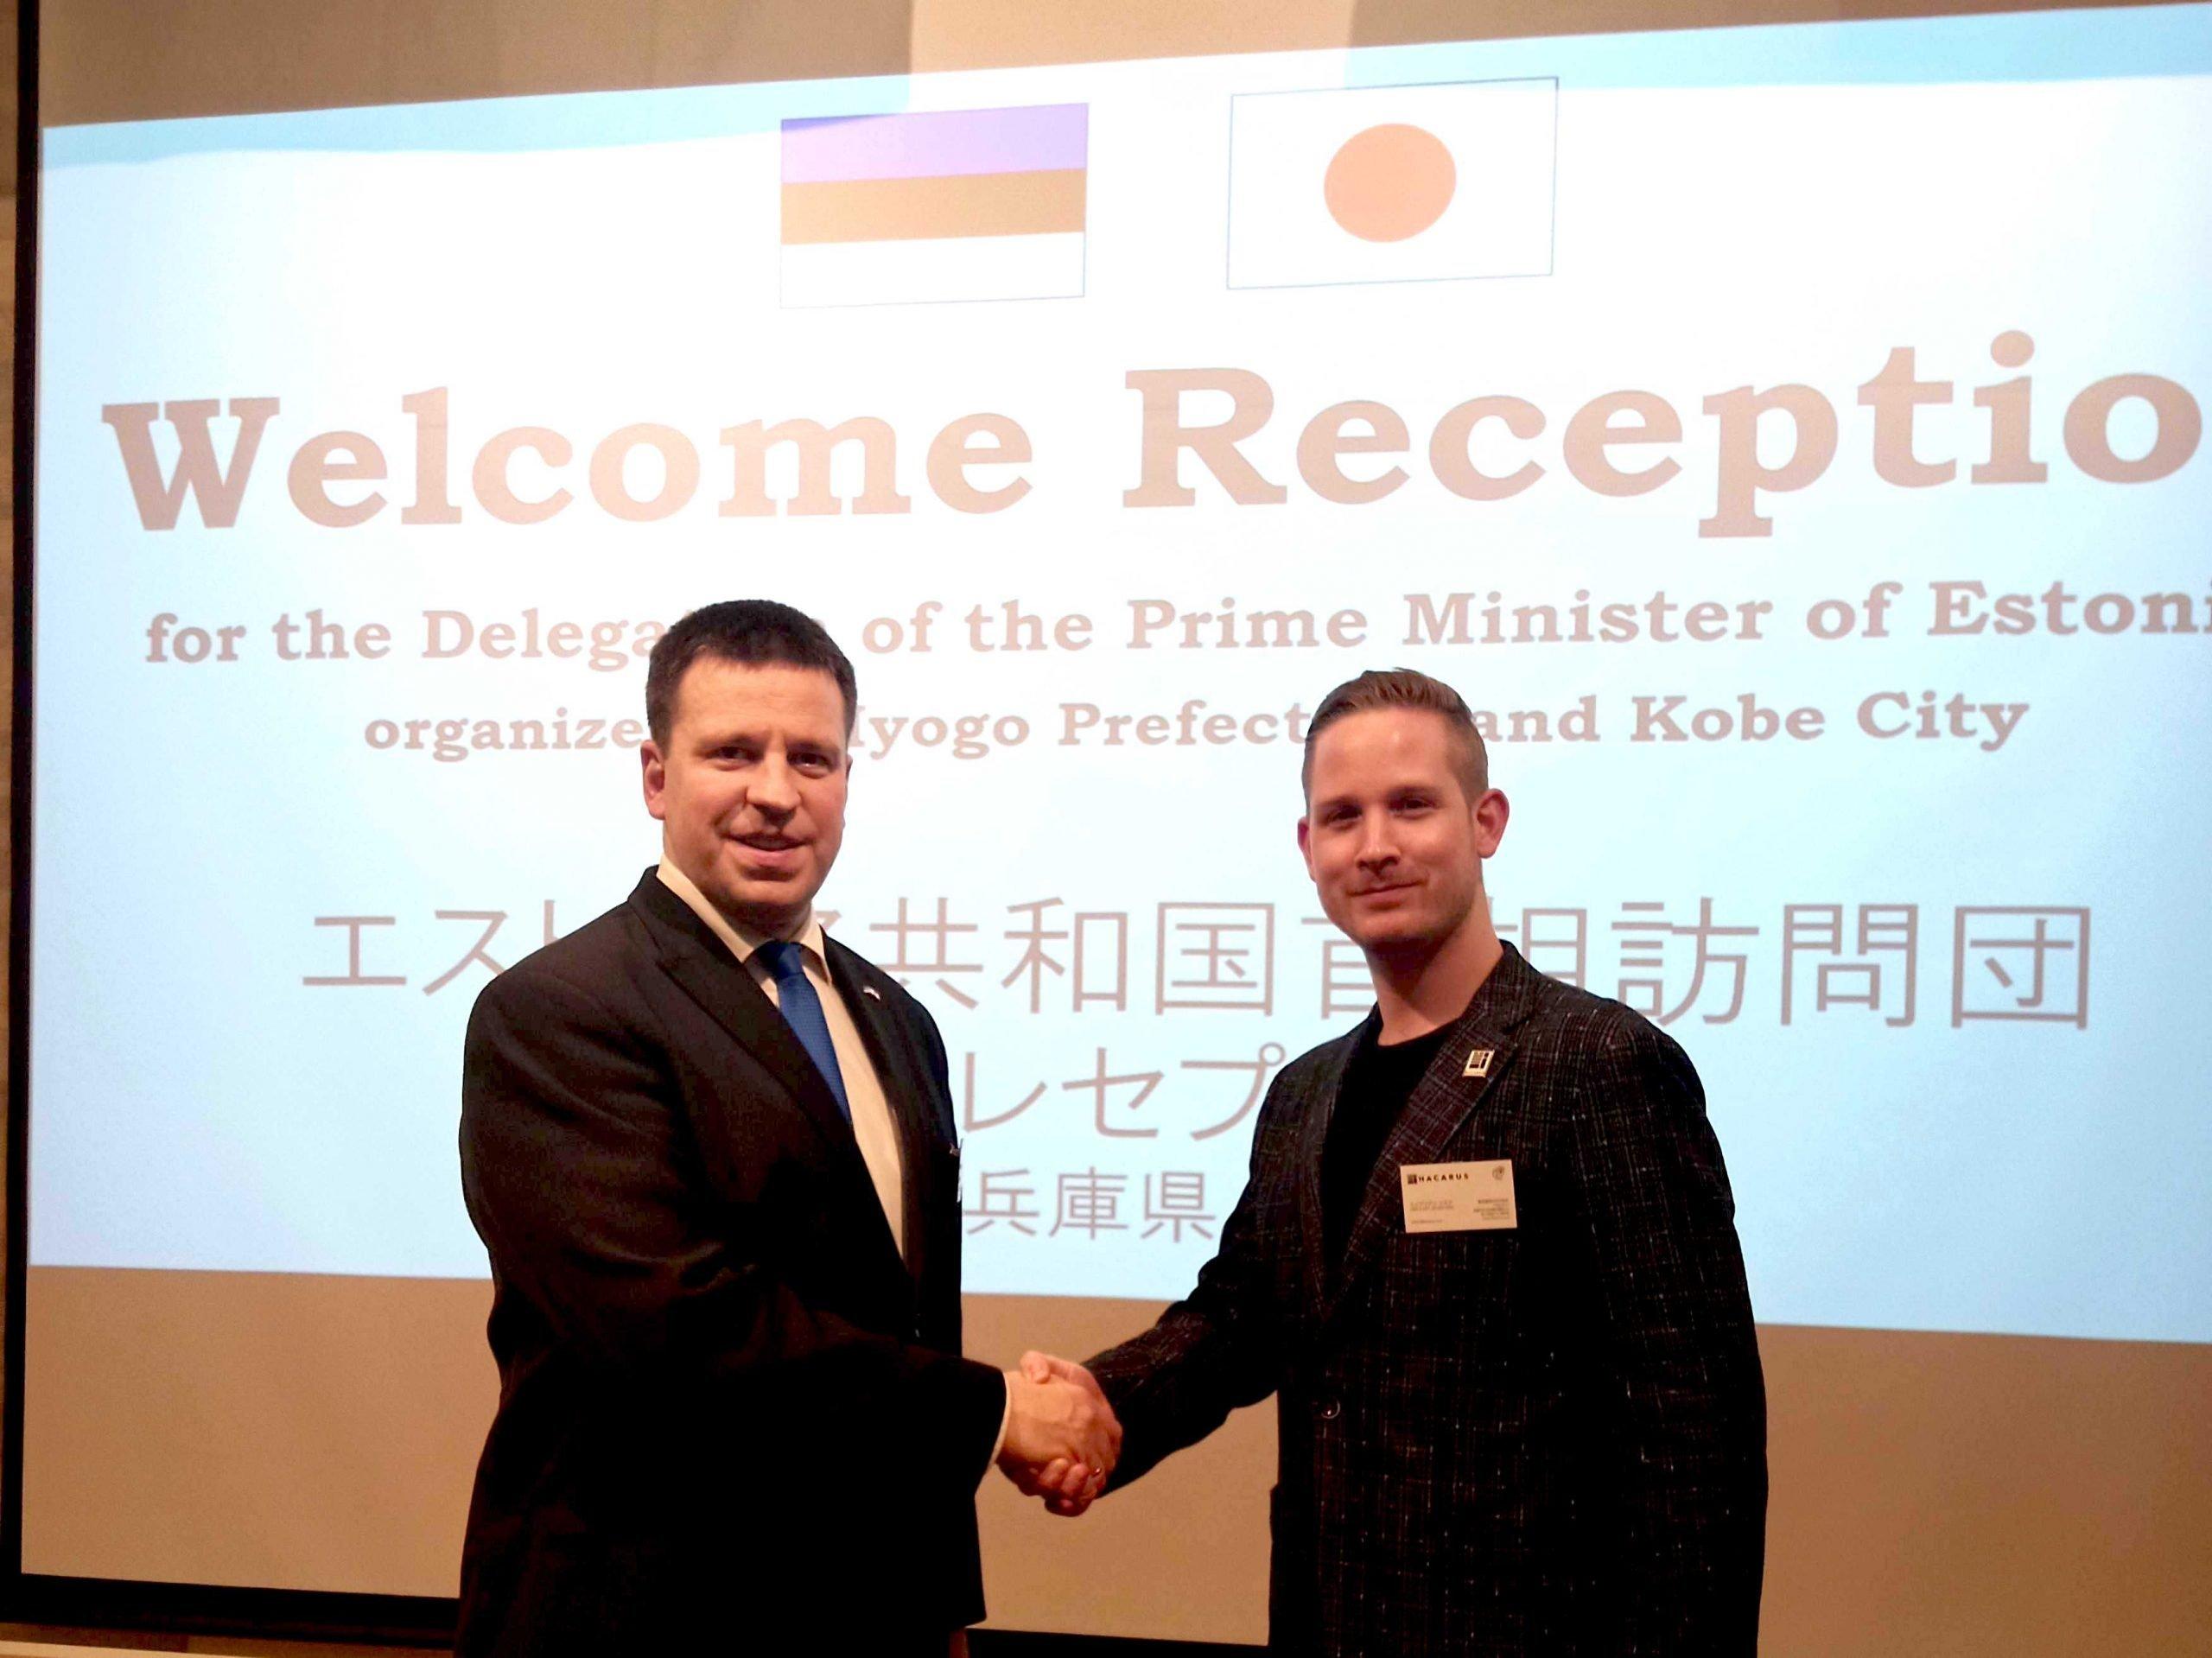 HACARUS Meeting With The Prime Minister Of Estonia Jüri Ratas